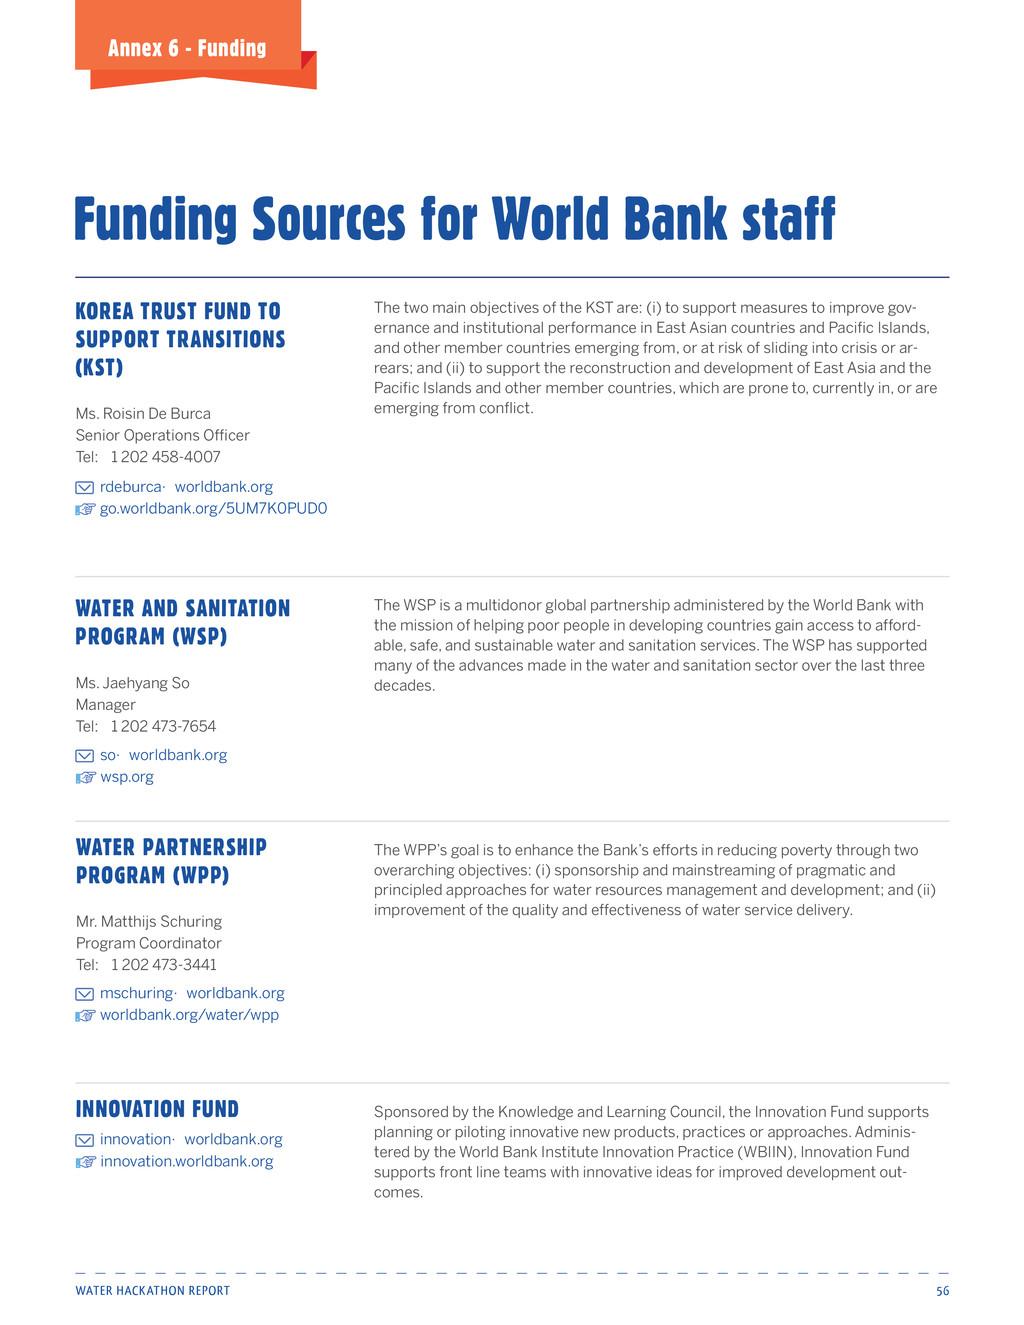 Water Hackathon Report 56 Annex 6 - Funding Fun...